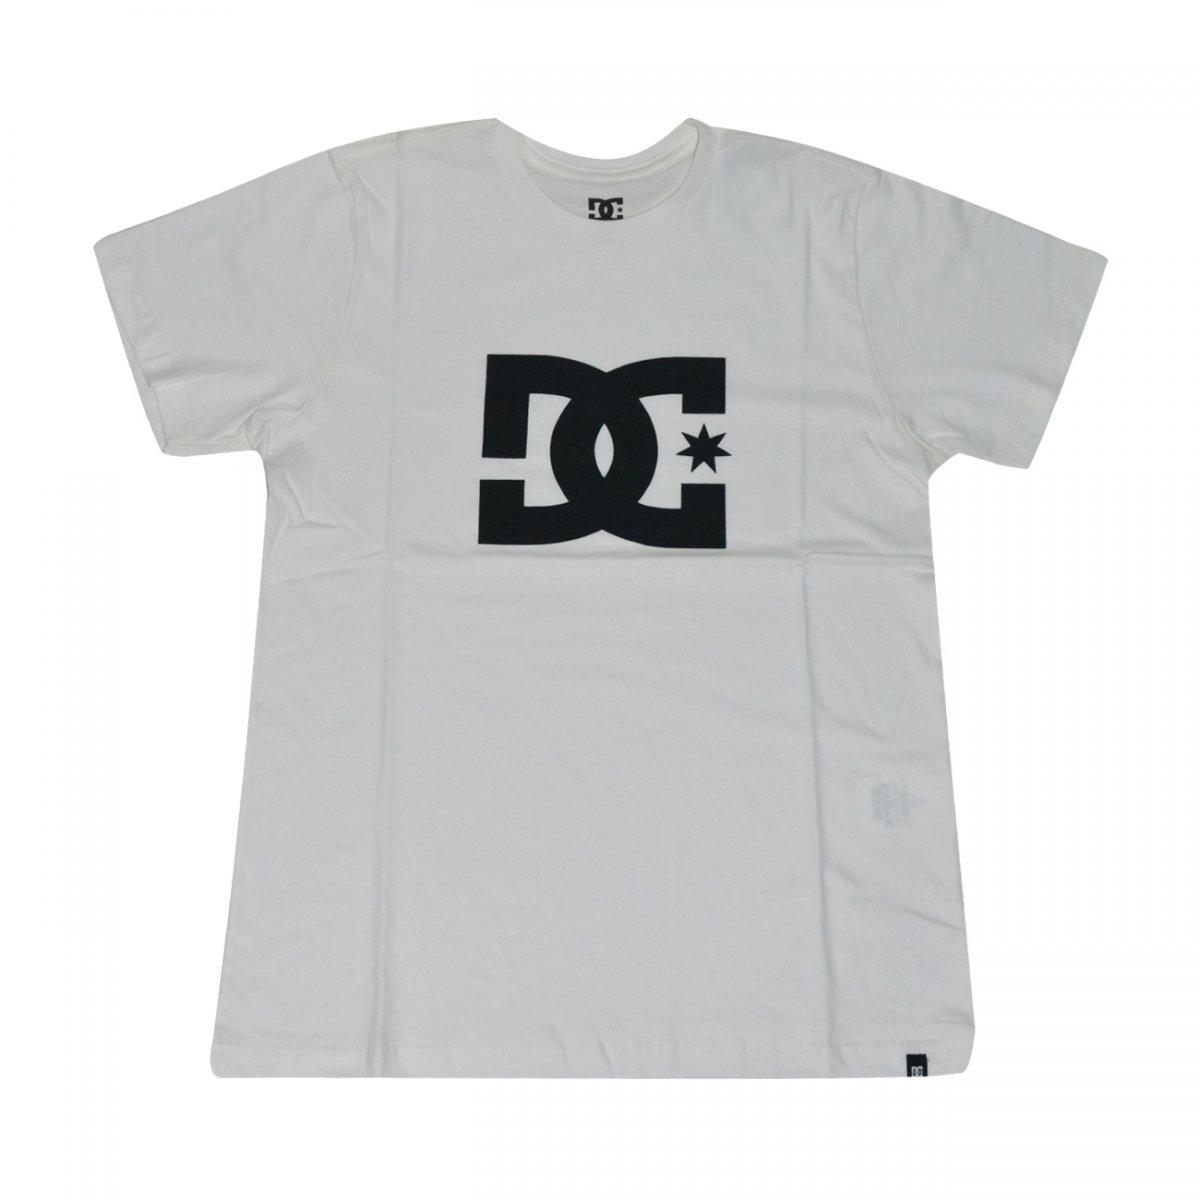 1720c1c9e9 comprar camiseta dc star juvenil